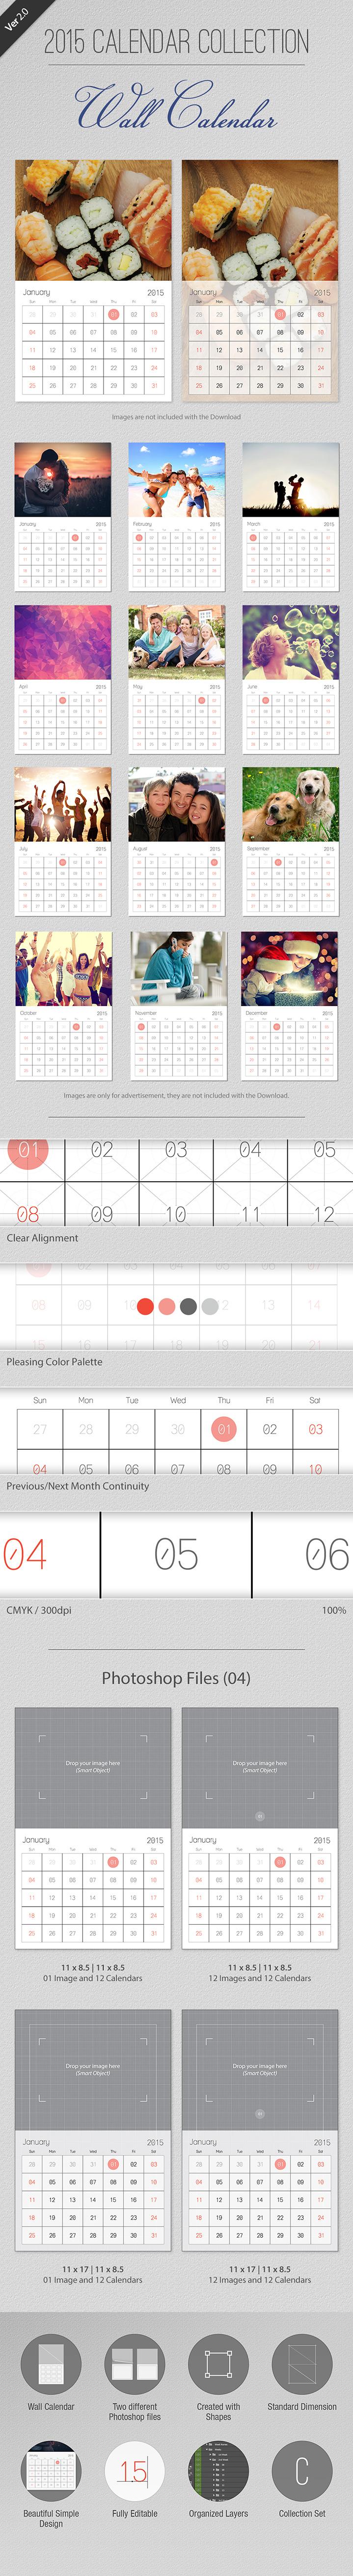 2015 Calendar Collection - Wall Calendar.jpg